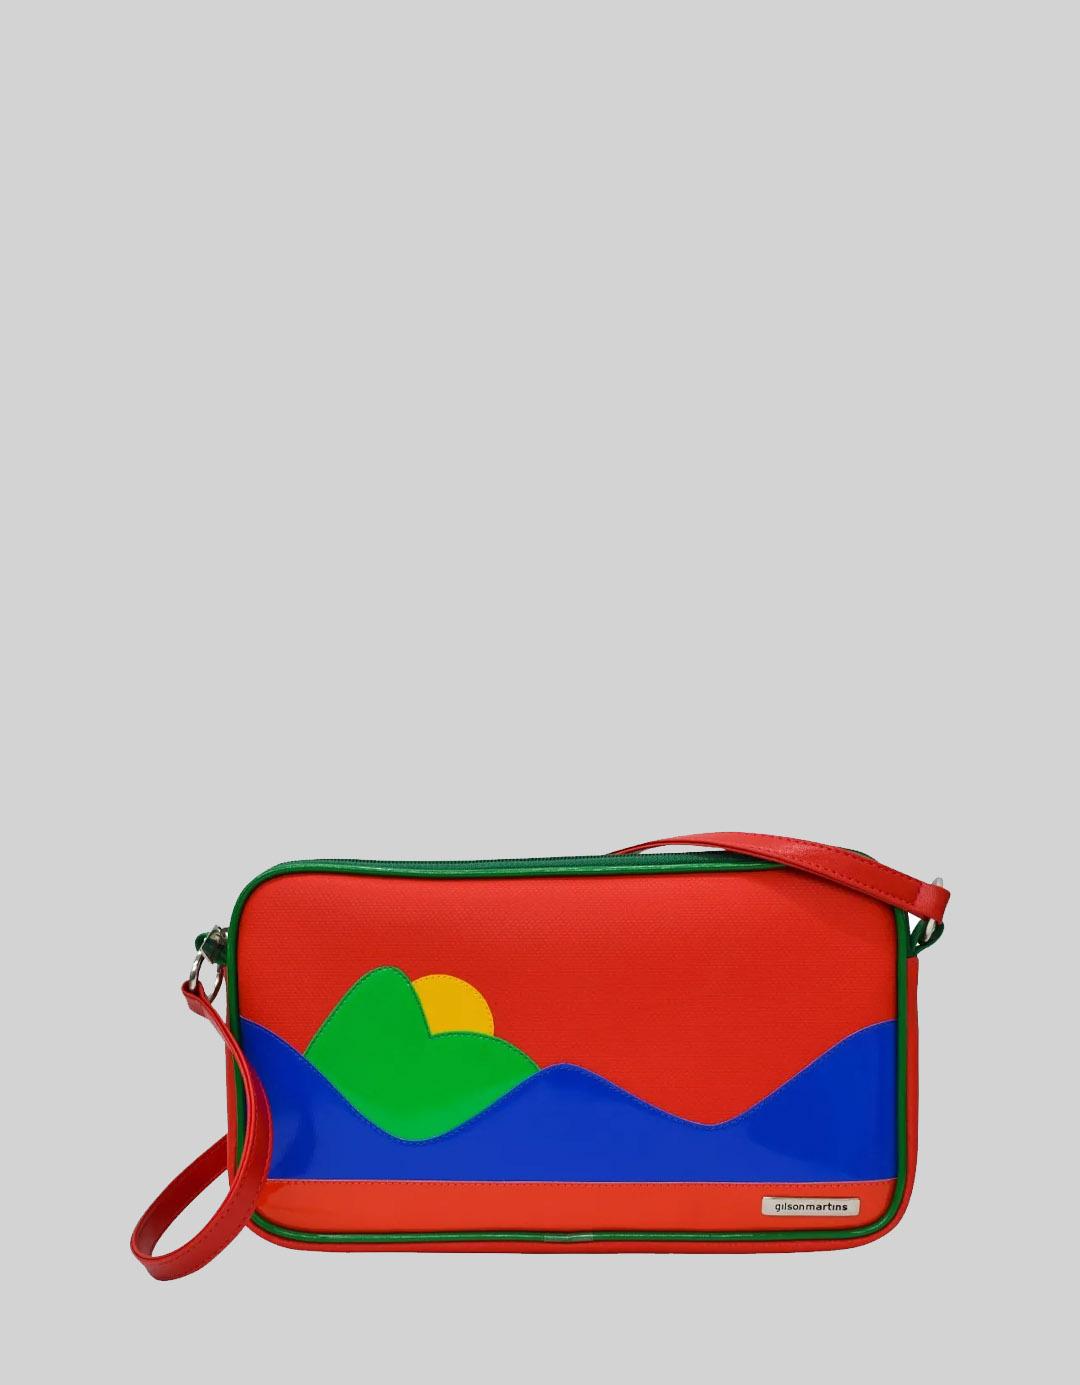 Bolsa Feminina de Ombro Vermelha Customizada Marie Rio